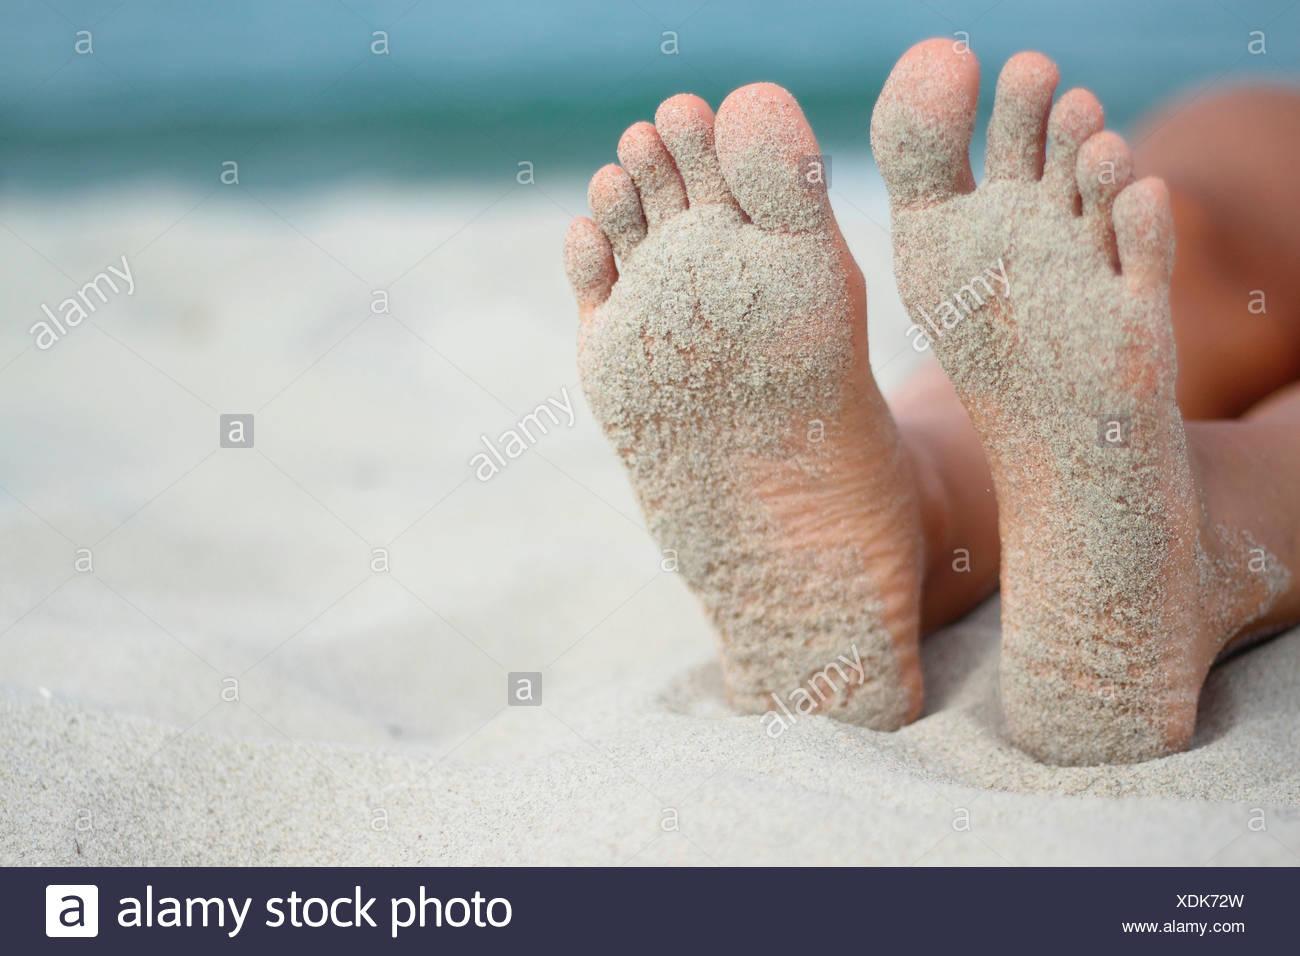 Italy, Sardinia, Person lying on beach, sandy feet - Stock Image